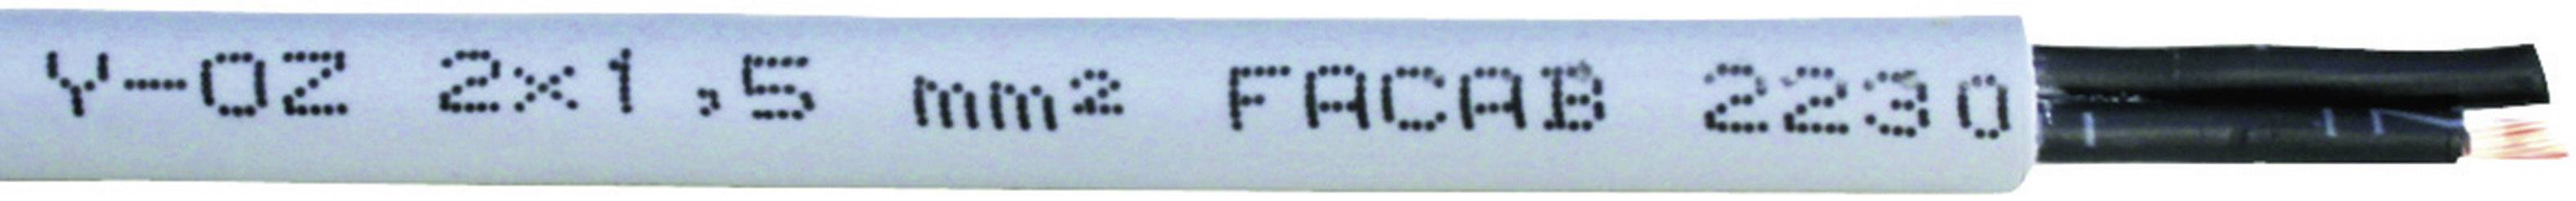 Riadiaci kábel Faber Kabel YSLY-OZ 030869, 4 x 0.50 mm², vonkajší Ø 5.70 mm, 500 V, metrový tovar, sivá